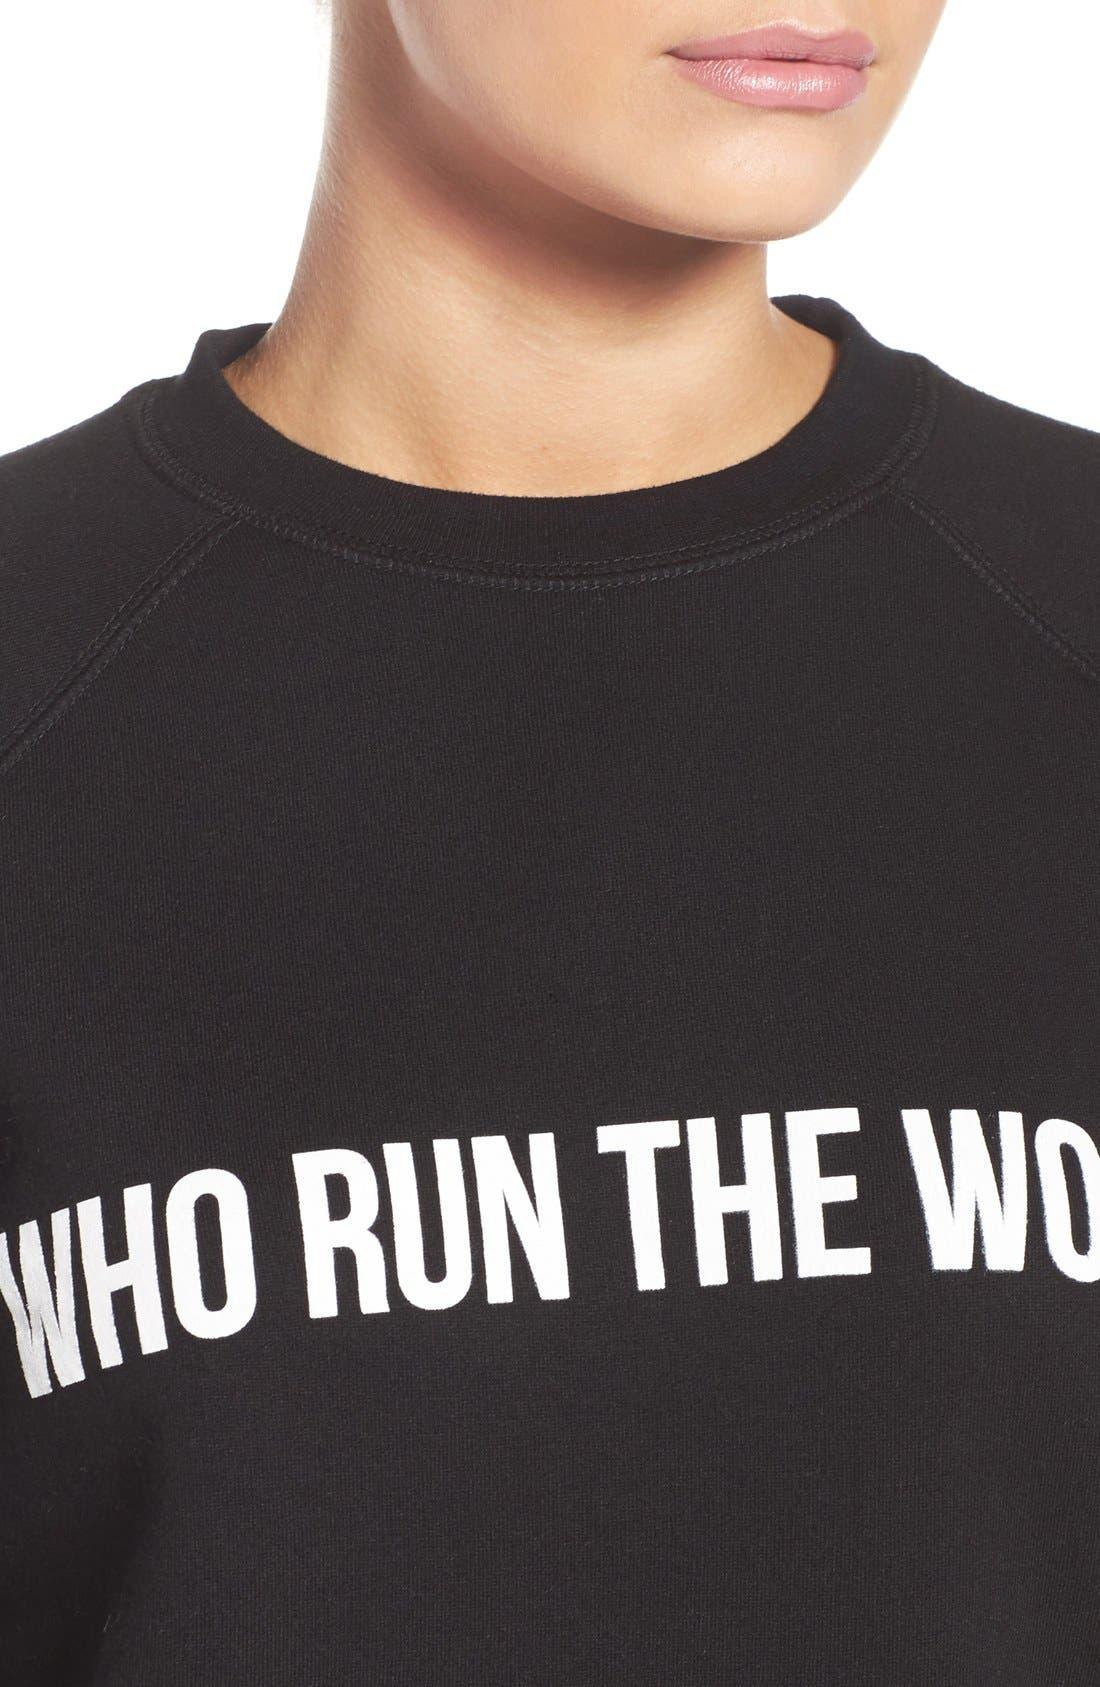 Who Run the World Sweatshirt,                             Alternate thumbnail 10, color,